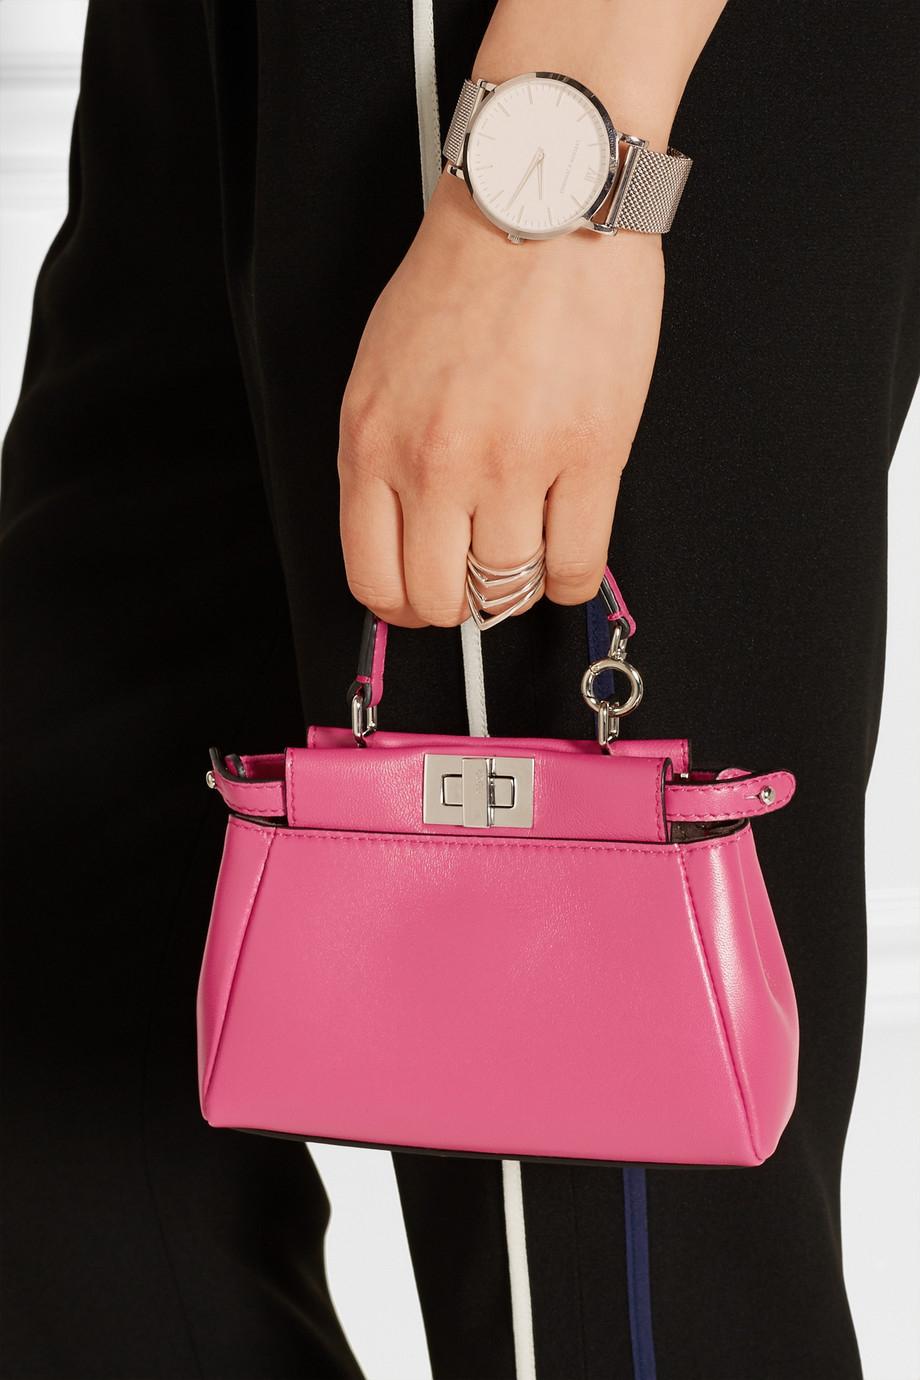 cf7380fd92 ... discount code for lyst fendi peekaboo micro leather shoulder bag in  pink f489d 954e5